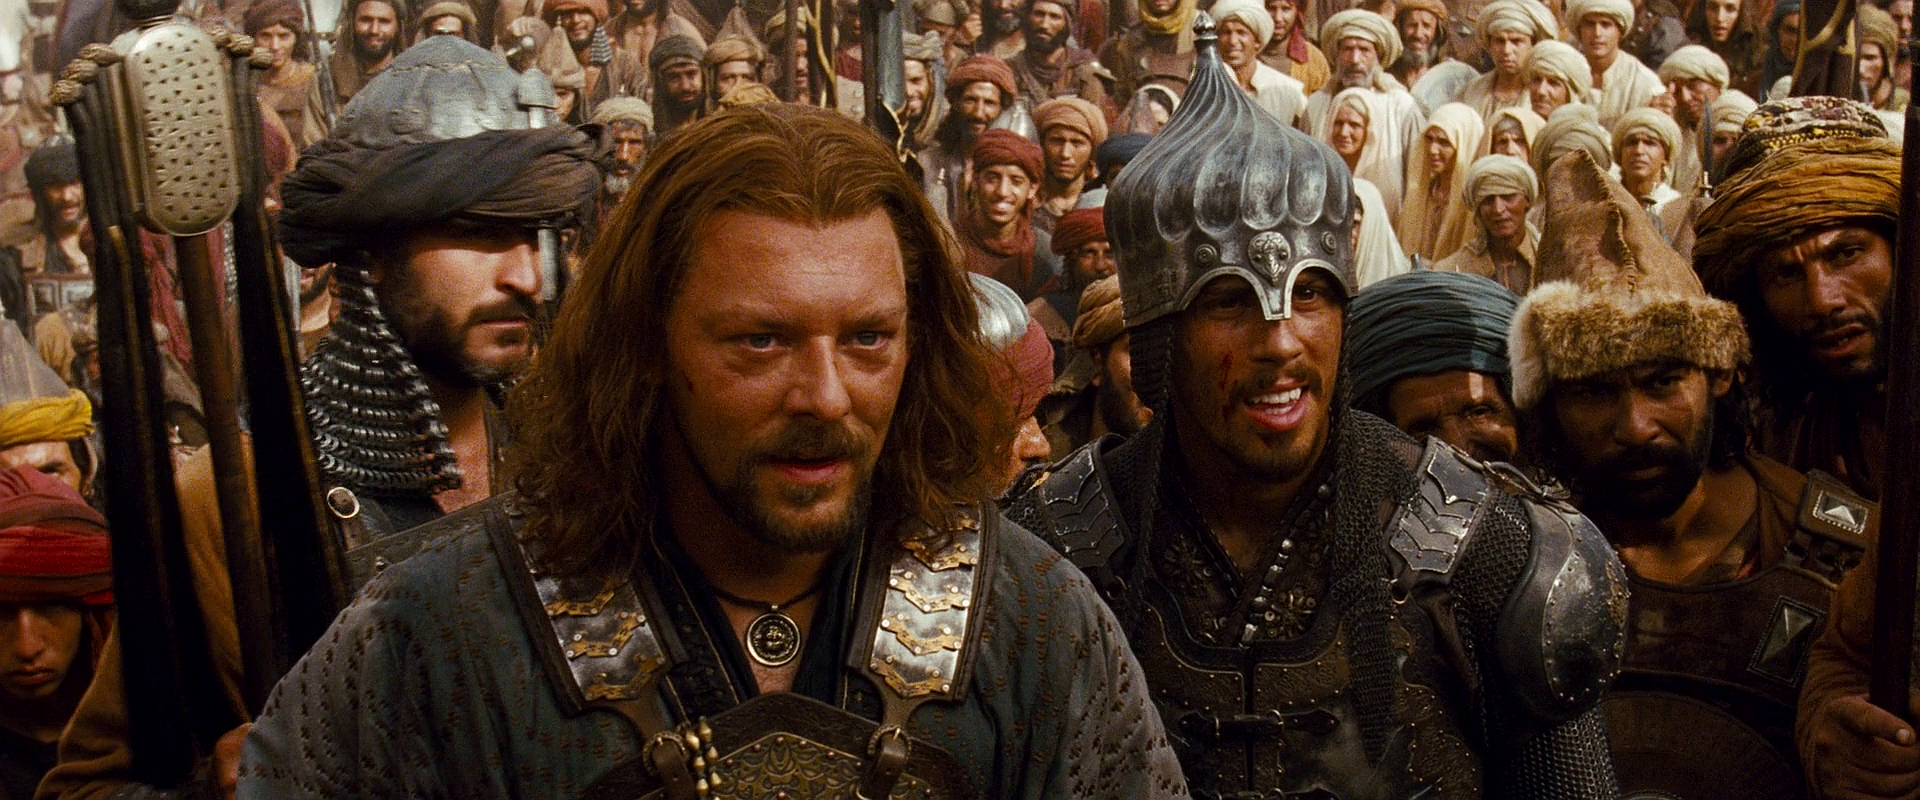 Принц Персии: Пески времени / Prince of Persia: The Sands of Time (2010/BDRip) 1080p от HELLYWOOD | D, A, L1